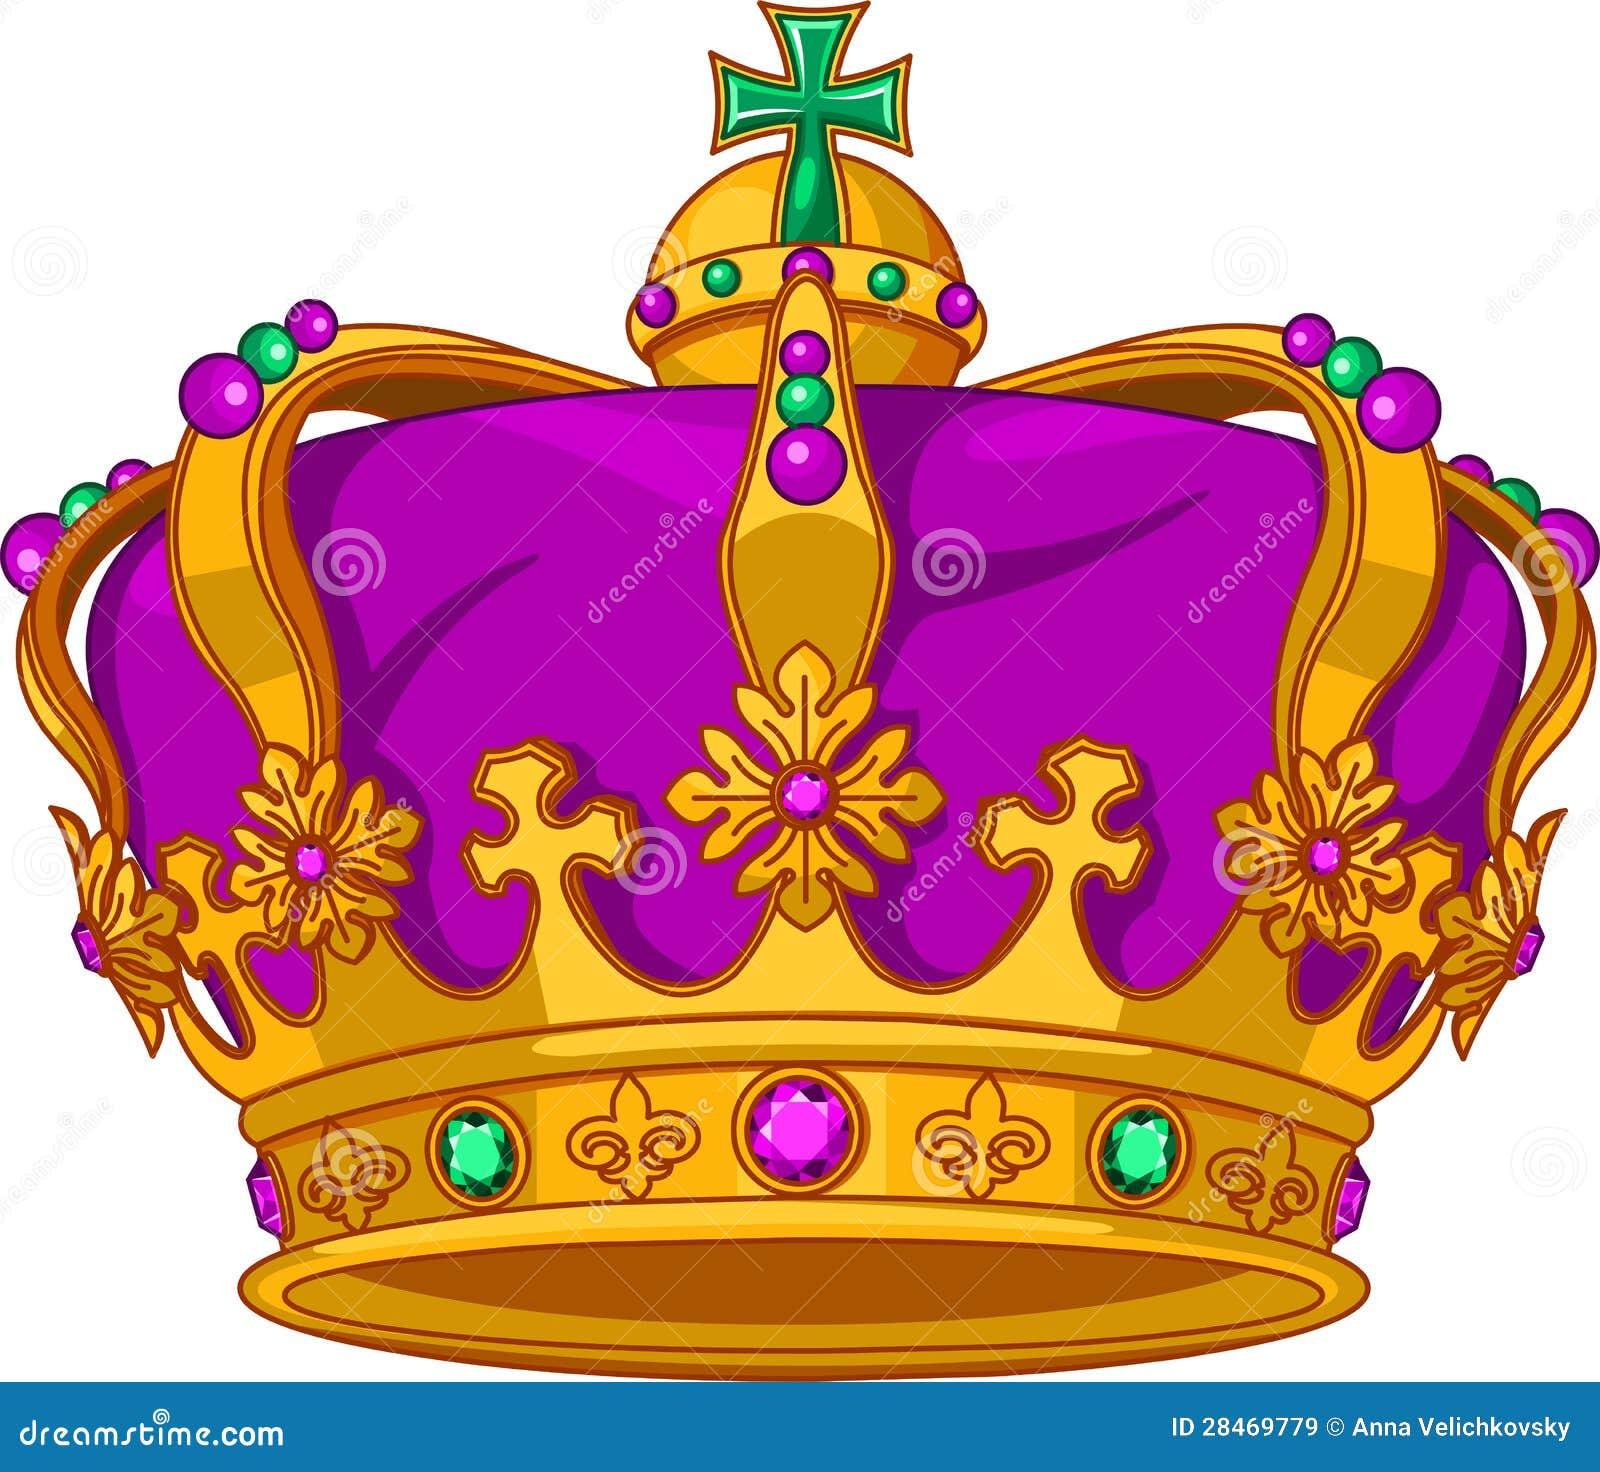 Mardi Gras Crown Clip Art Mardi gras crown